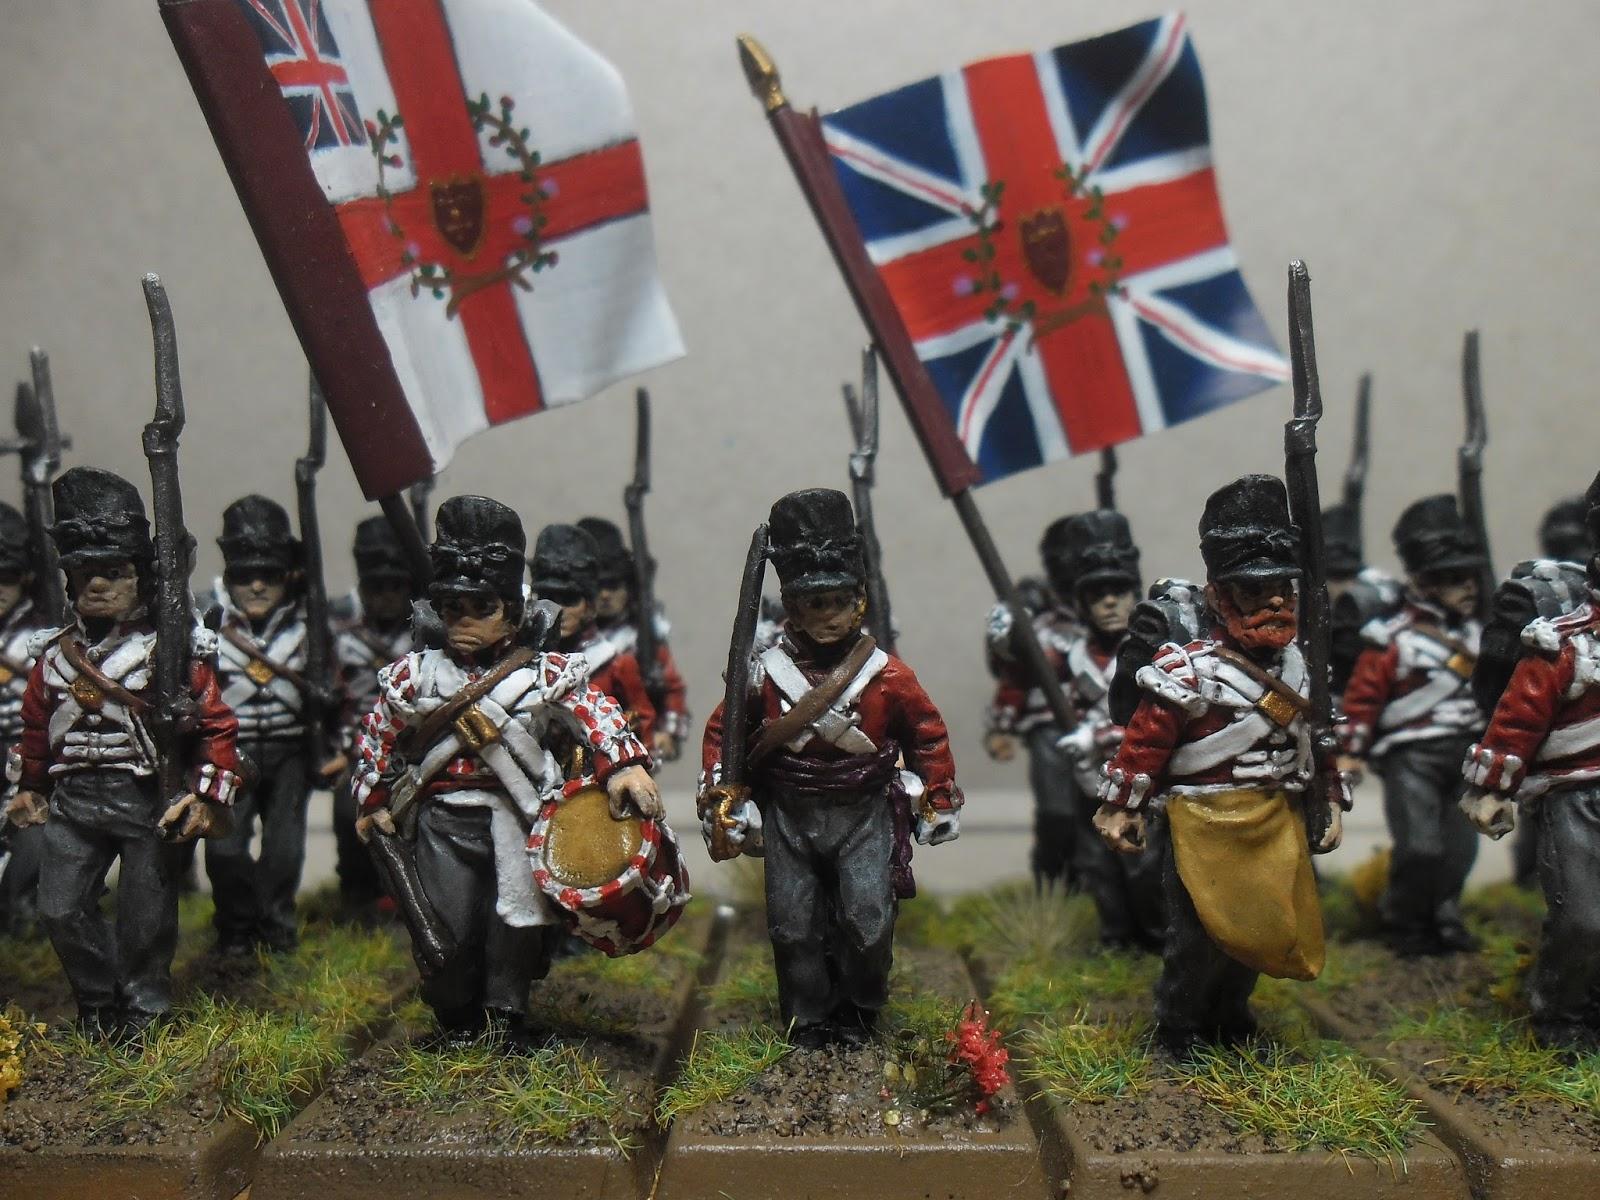 33rd Regiment of Foot 33rd%2BRegiment%2Bof%2BFoot%2B%25286%2529